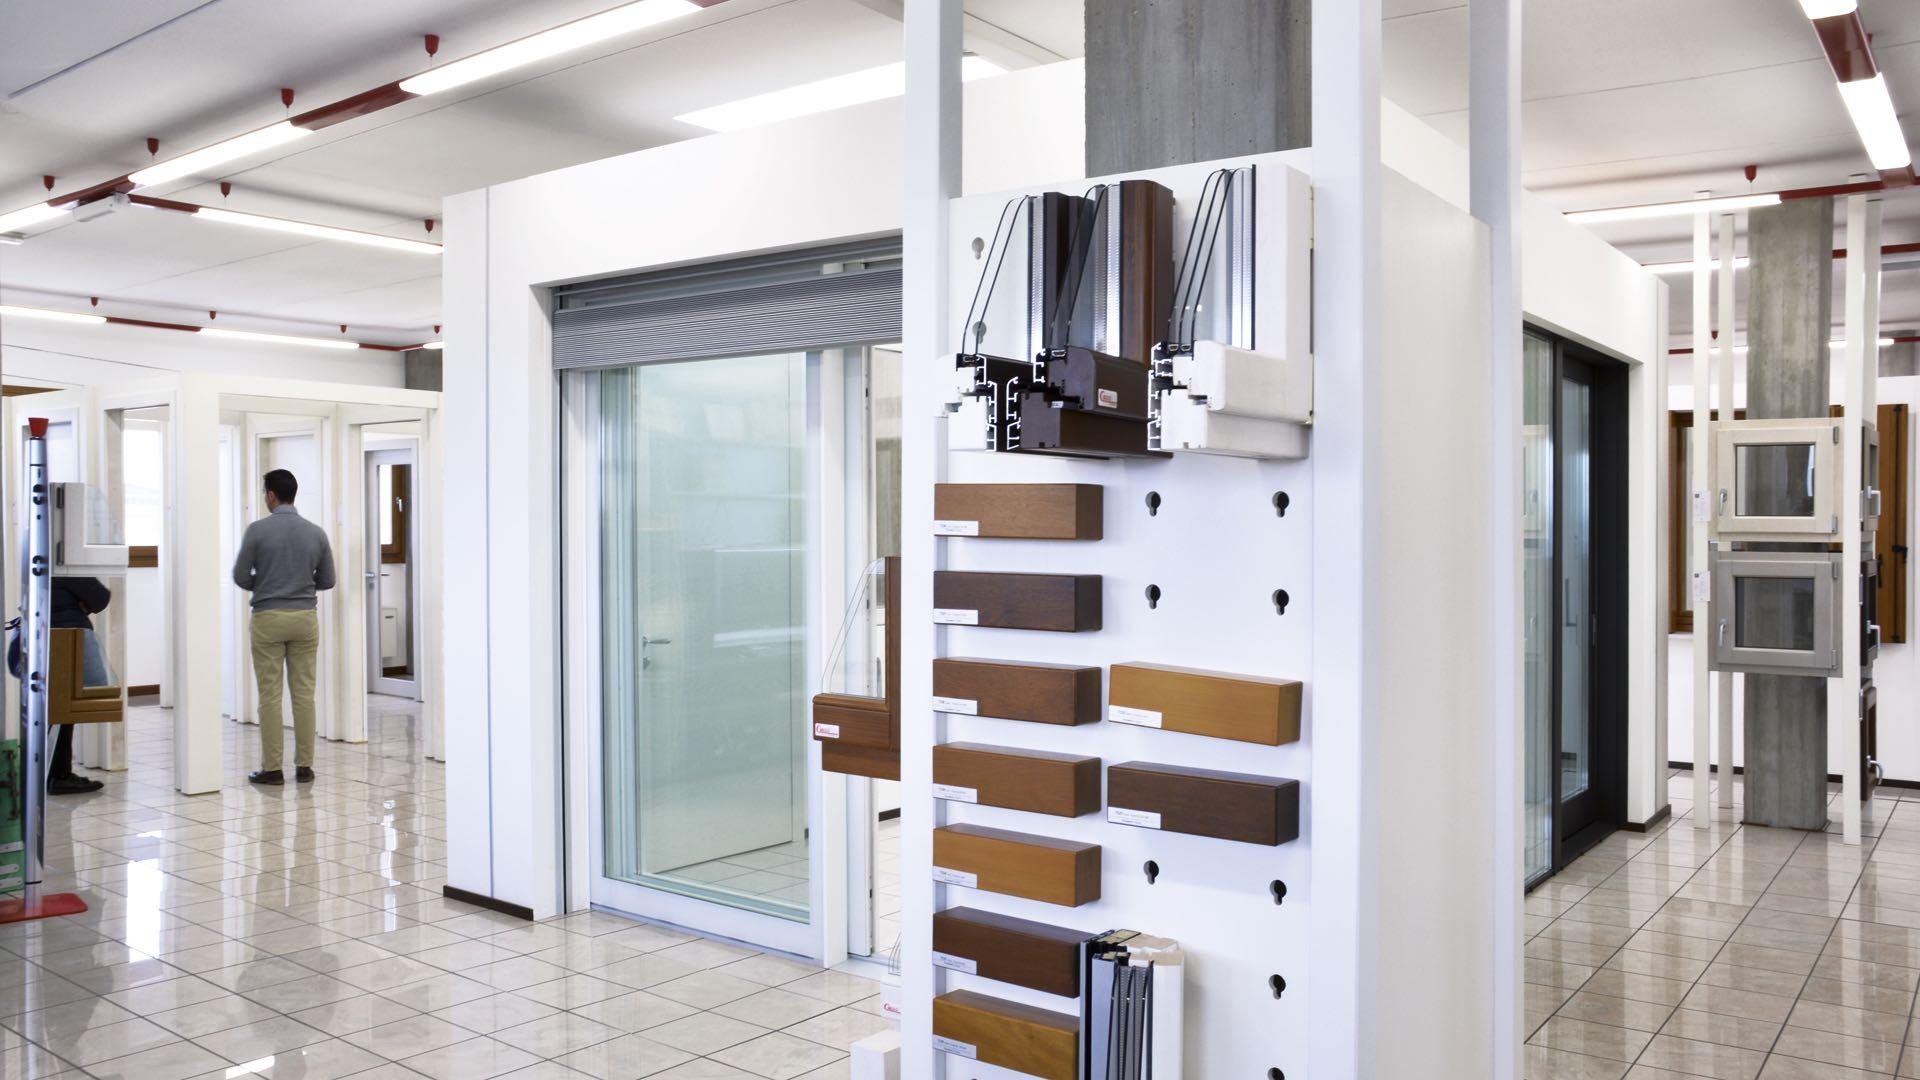 Showroom serramenti finestre porte interne e blindate - Finestre e infissi ...